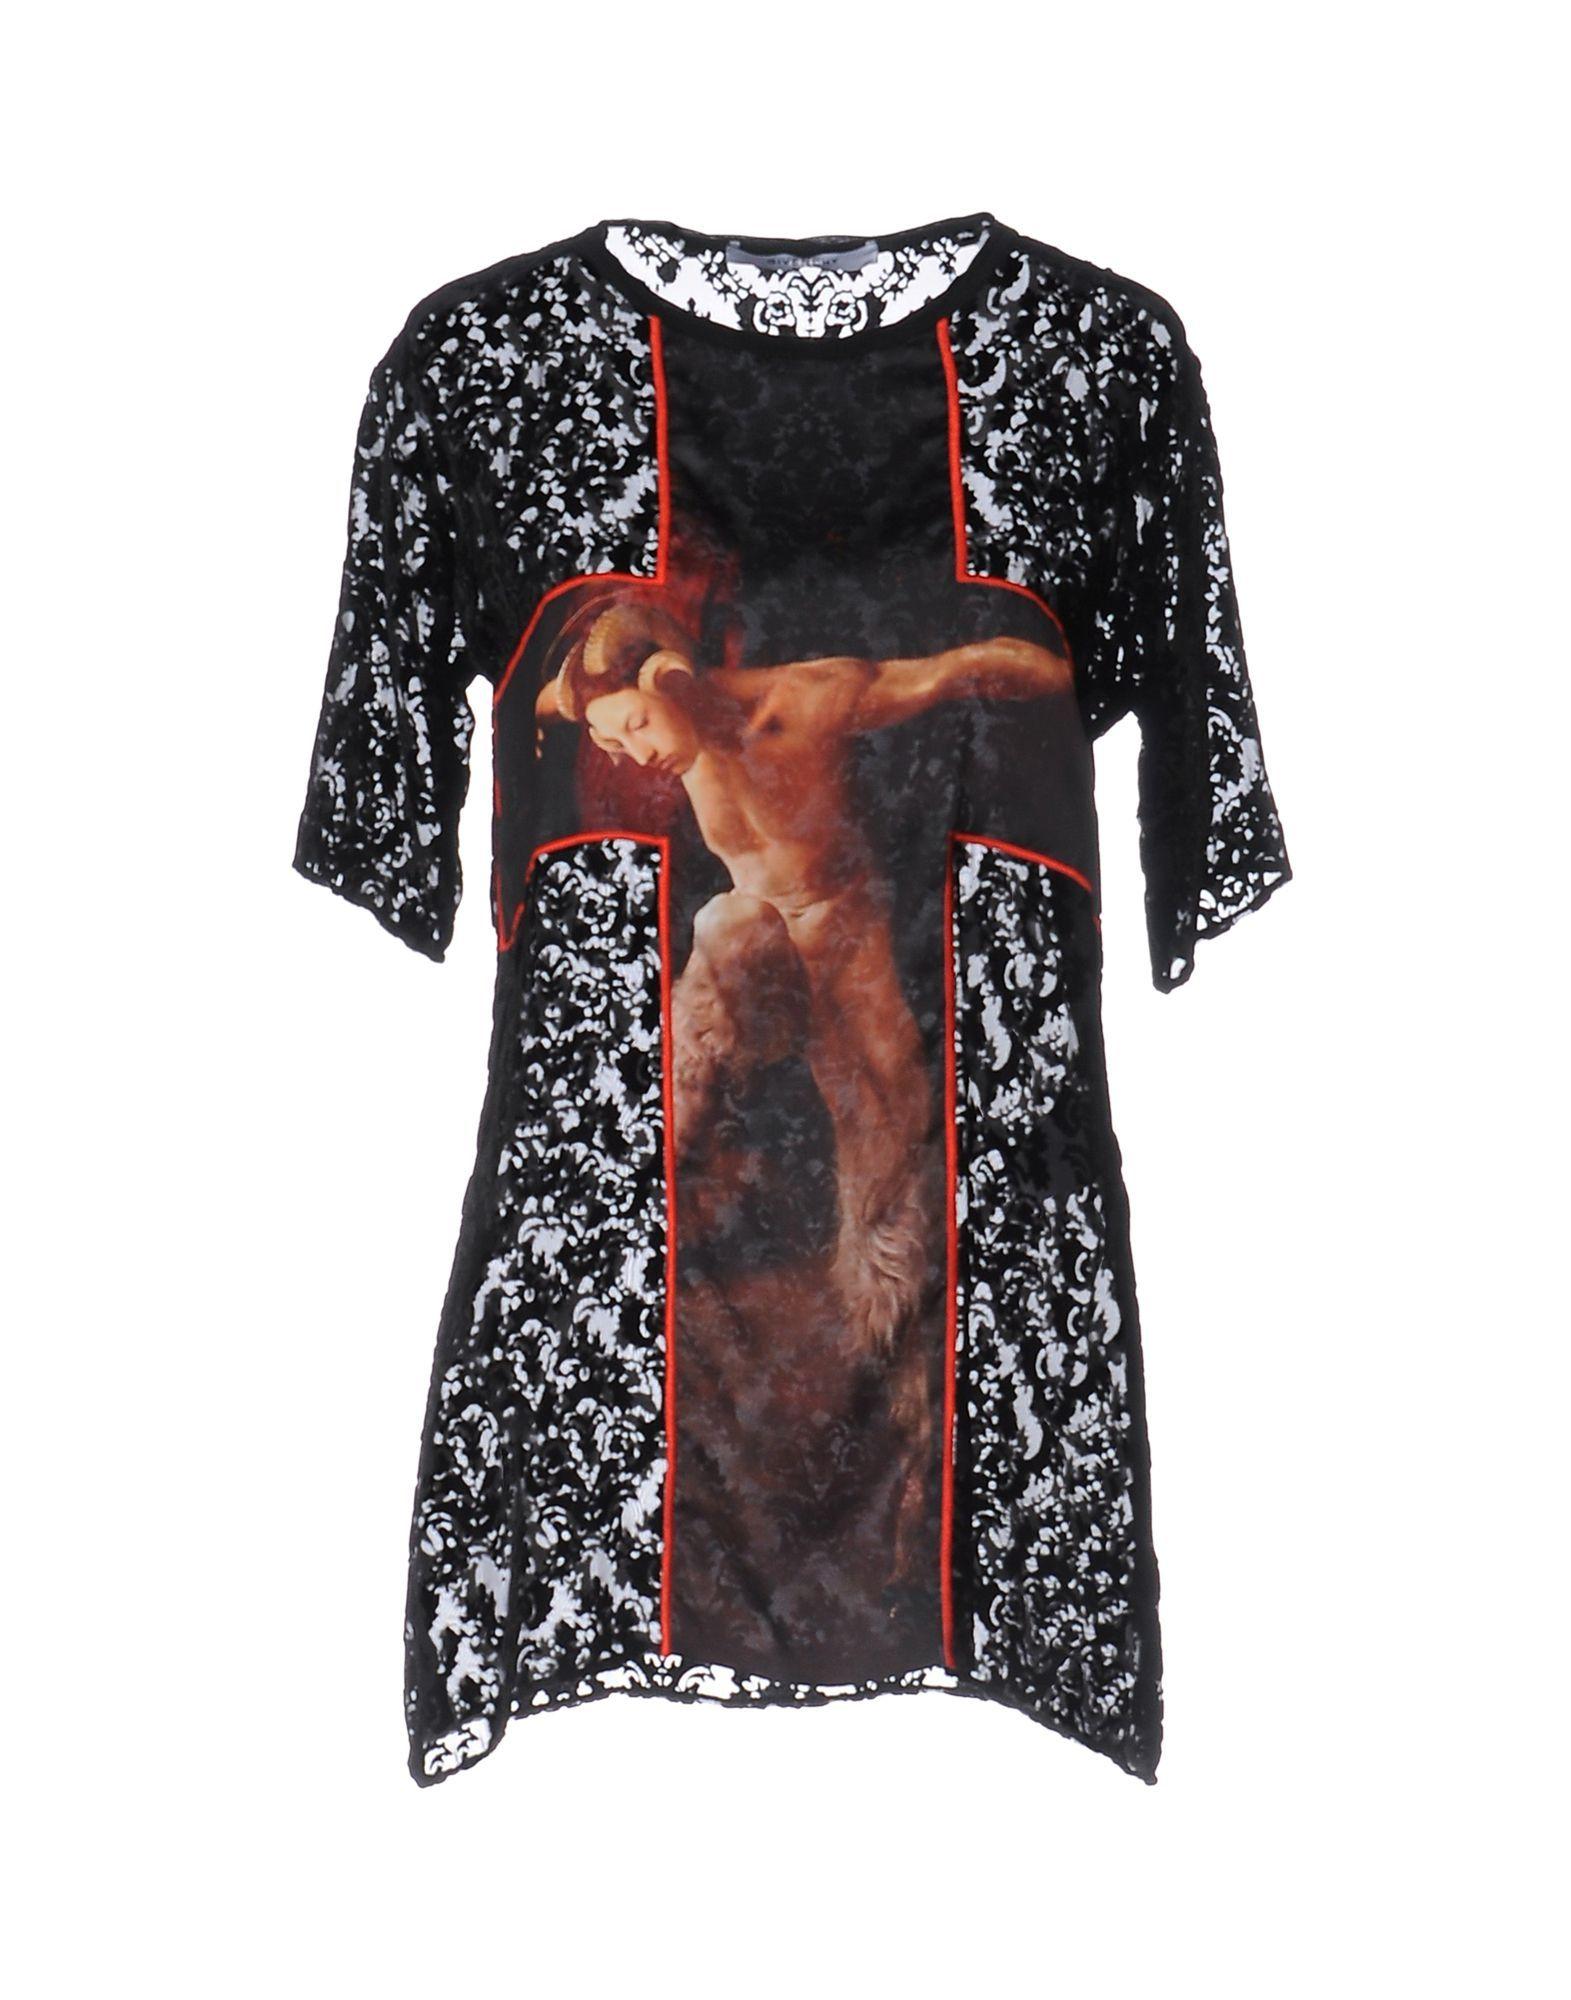 Givenchy Black Lace Short Sleeve T-Shirt